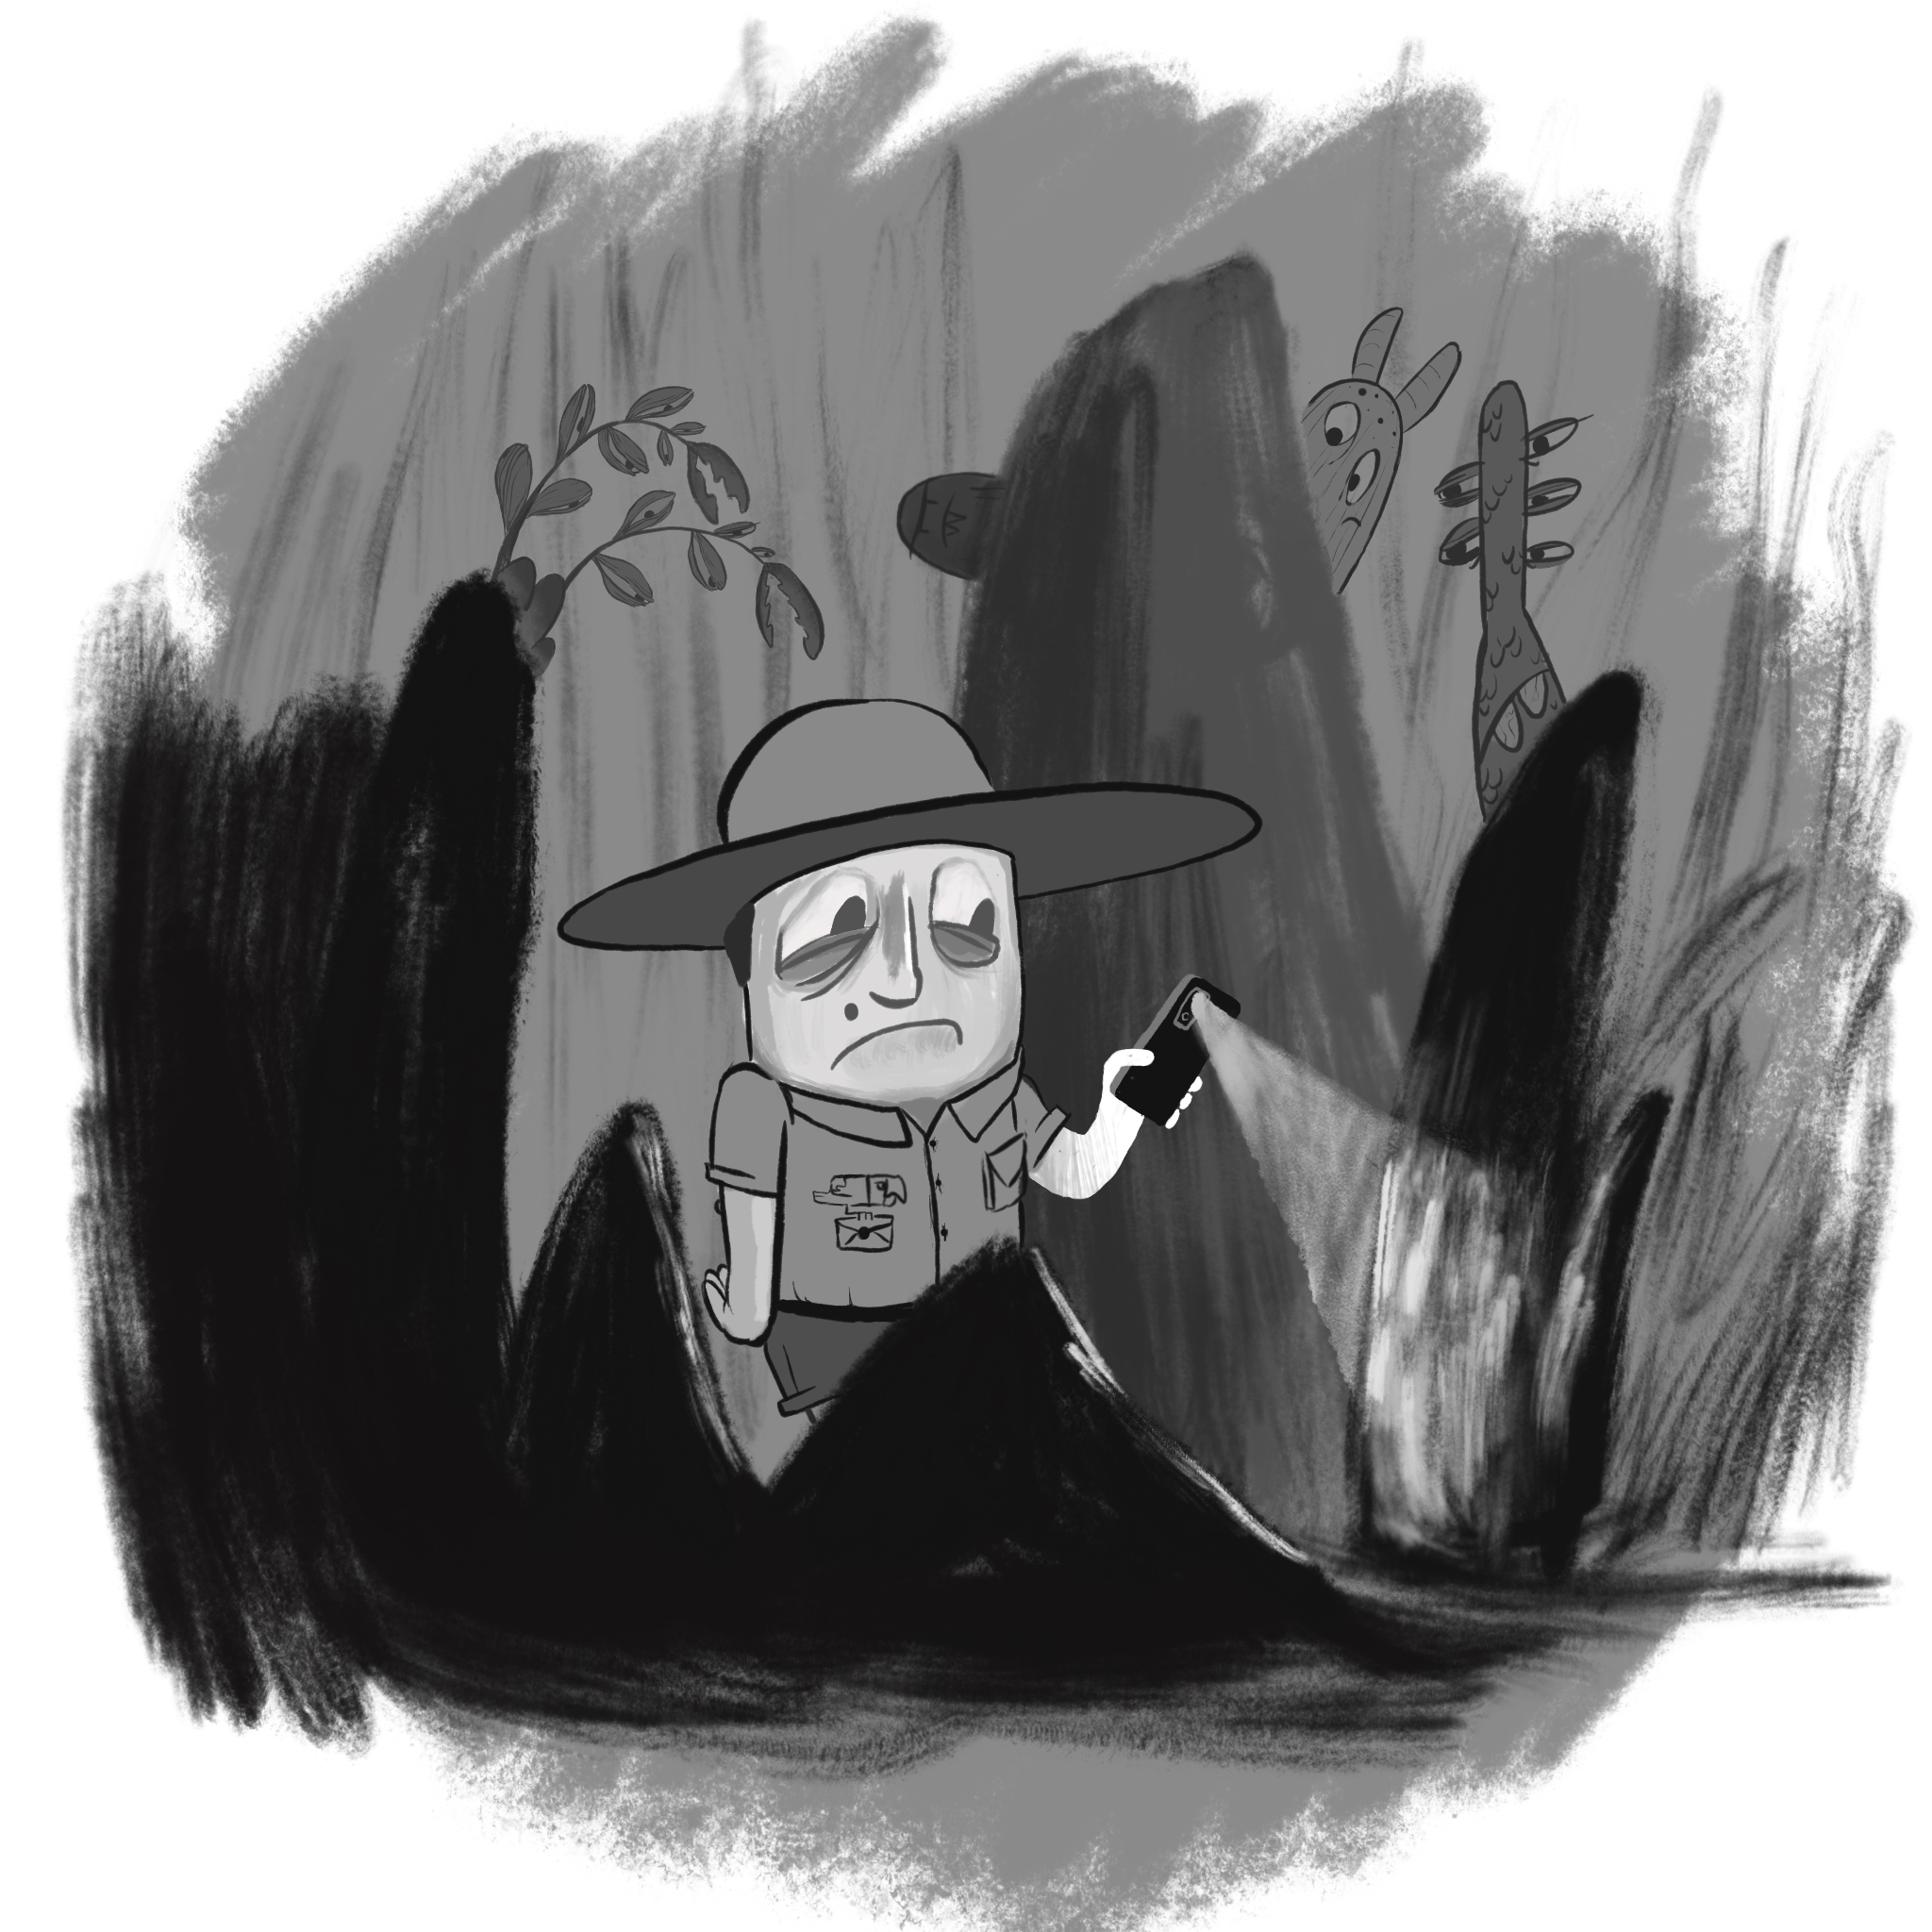 Cave_Explorer_06.jpg